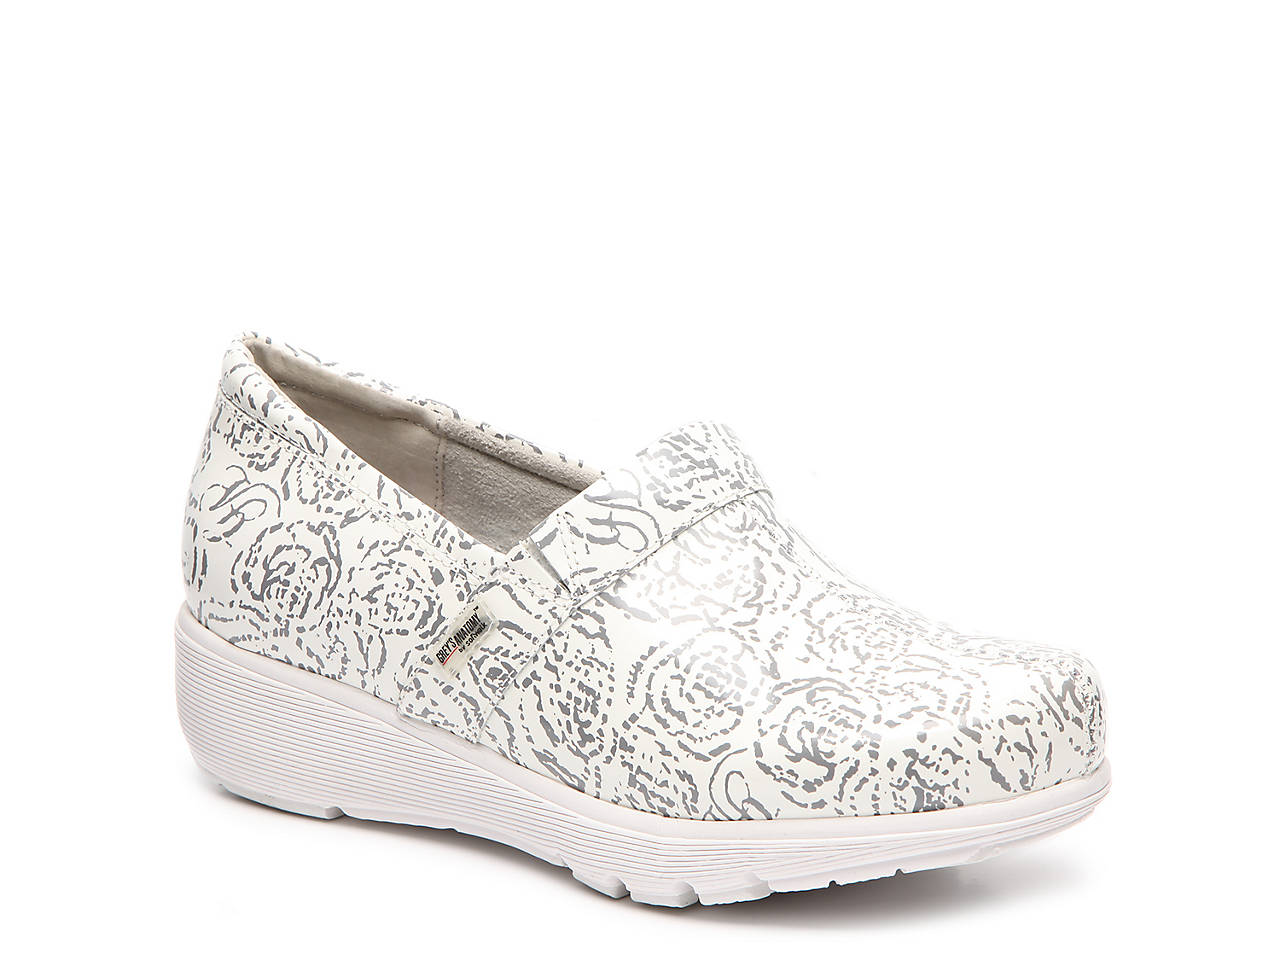 Grey\'s Anatomy by Softwalk Meredith Work Clog Women\'s Shoes   DSW